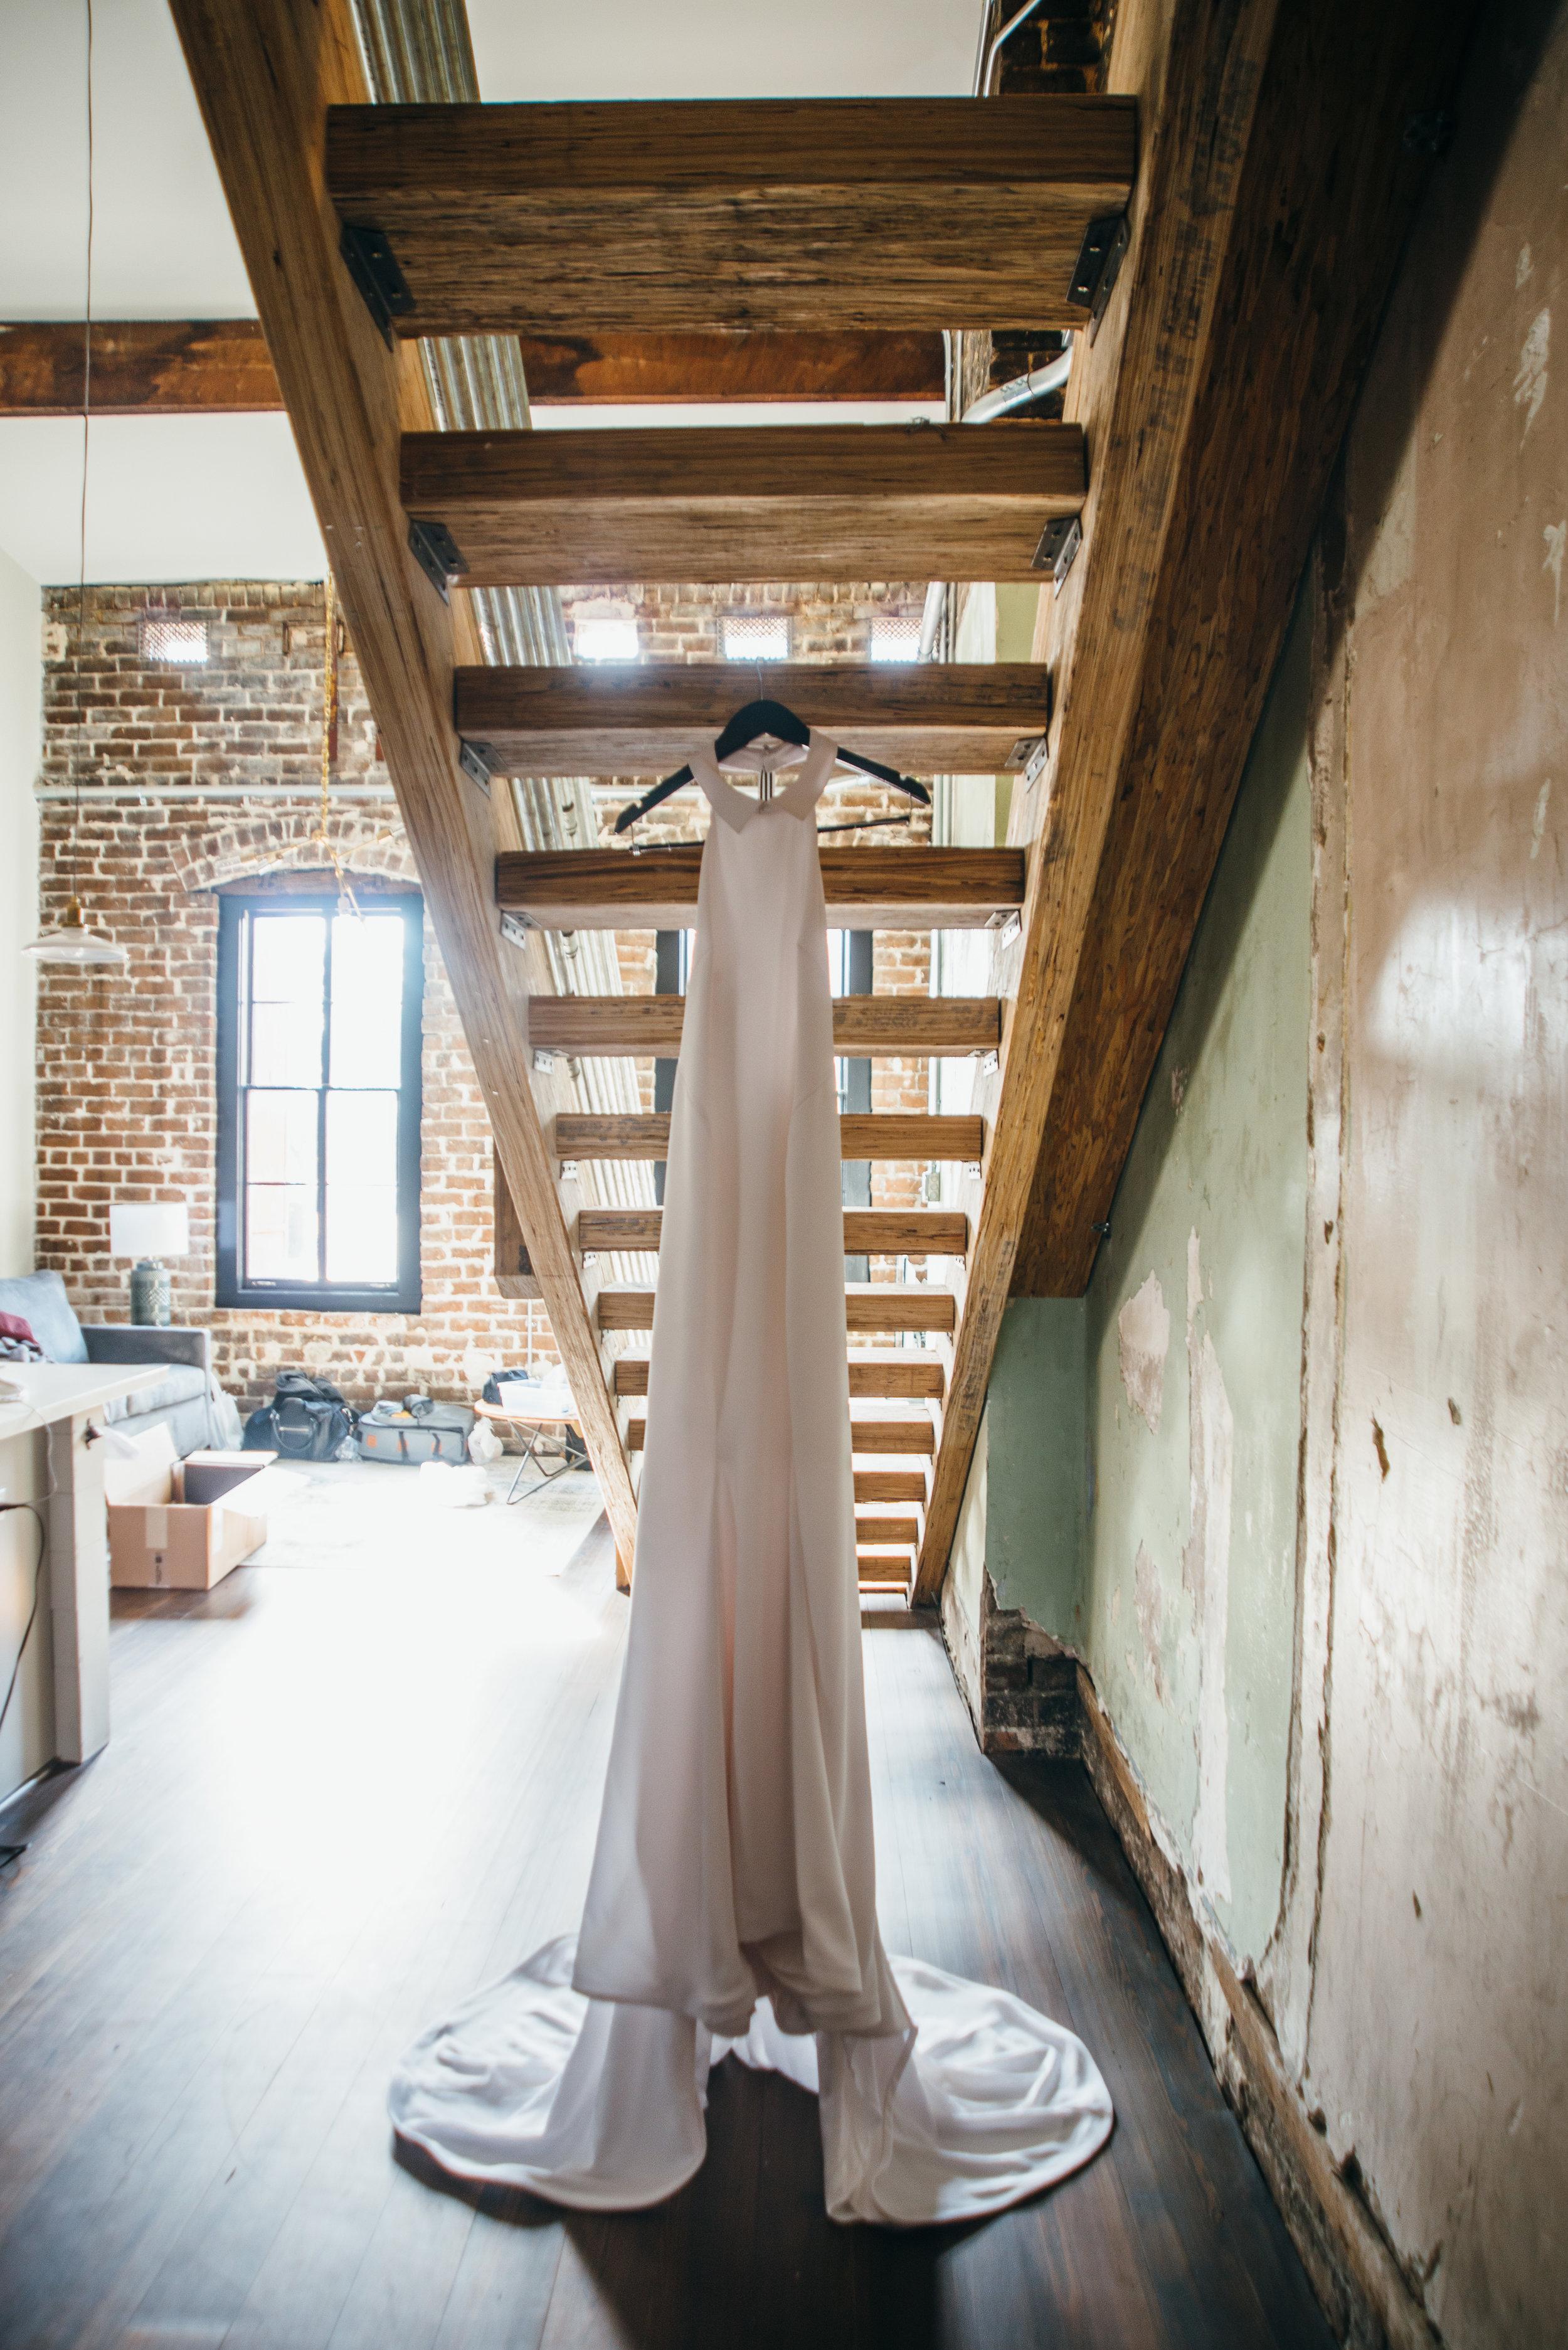 julia-hembree-photography-eden-village-church-wedding-savannah-warehouse-wedding-ivory-and-beau-bridal-boutique-savannah-florist-savannah-wedding-planner-savannah-event-design-scad-wedding-artist-wedding-savannah-funky-wedding-handmade-wedding-7.jpg